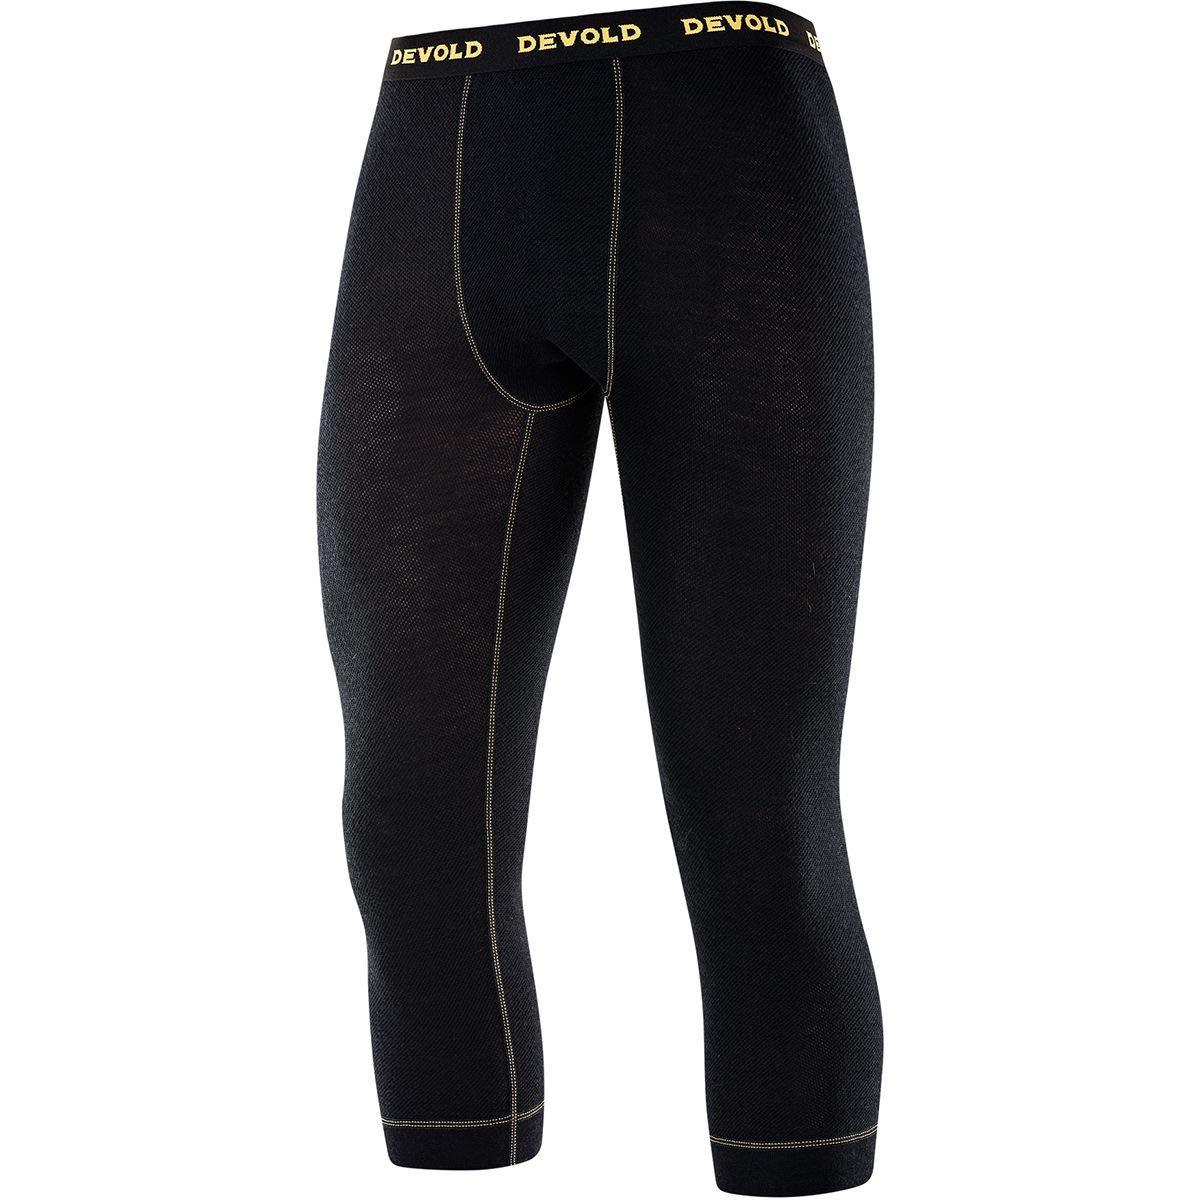 Devold 190 Performance Wool Mesh 3/4 Long Johns Pants Men - Merinowäsche